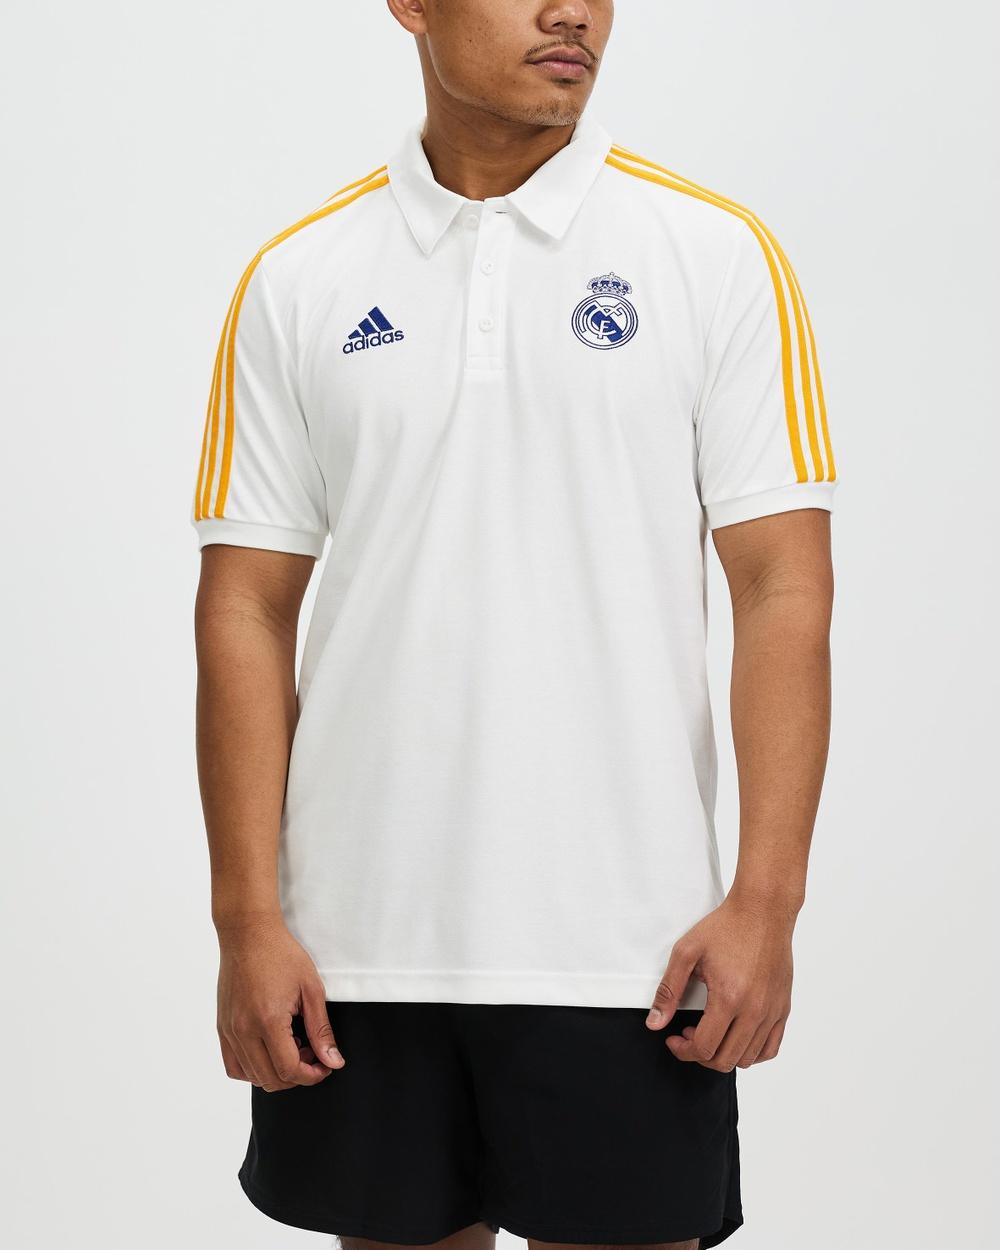 adidas Performance Real Madrid 3 Stripes Polo Shirt Shirts & Polos White, Victory Blue Lucky Orange 3-Stripes